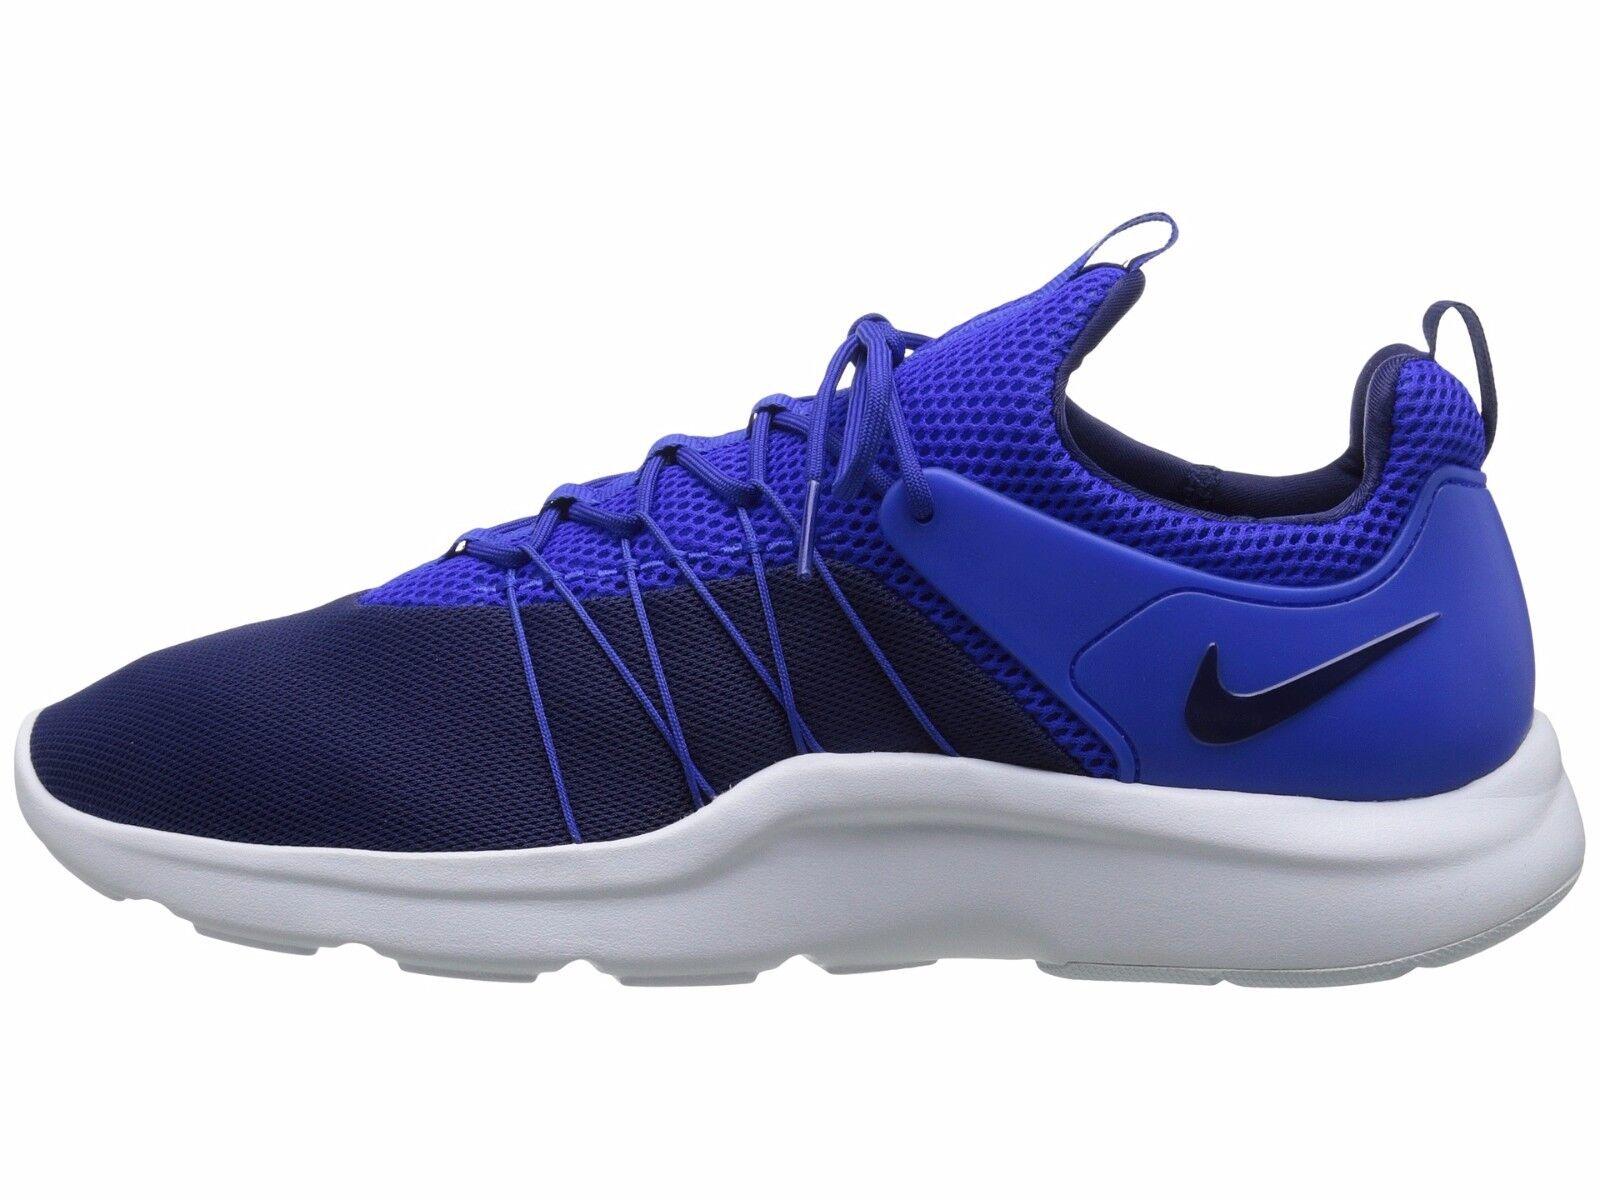 819803-444 Nike Darwin Running Shoes Royal/White Sizes 8-12 New In Box